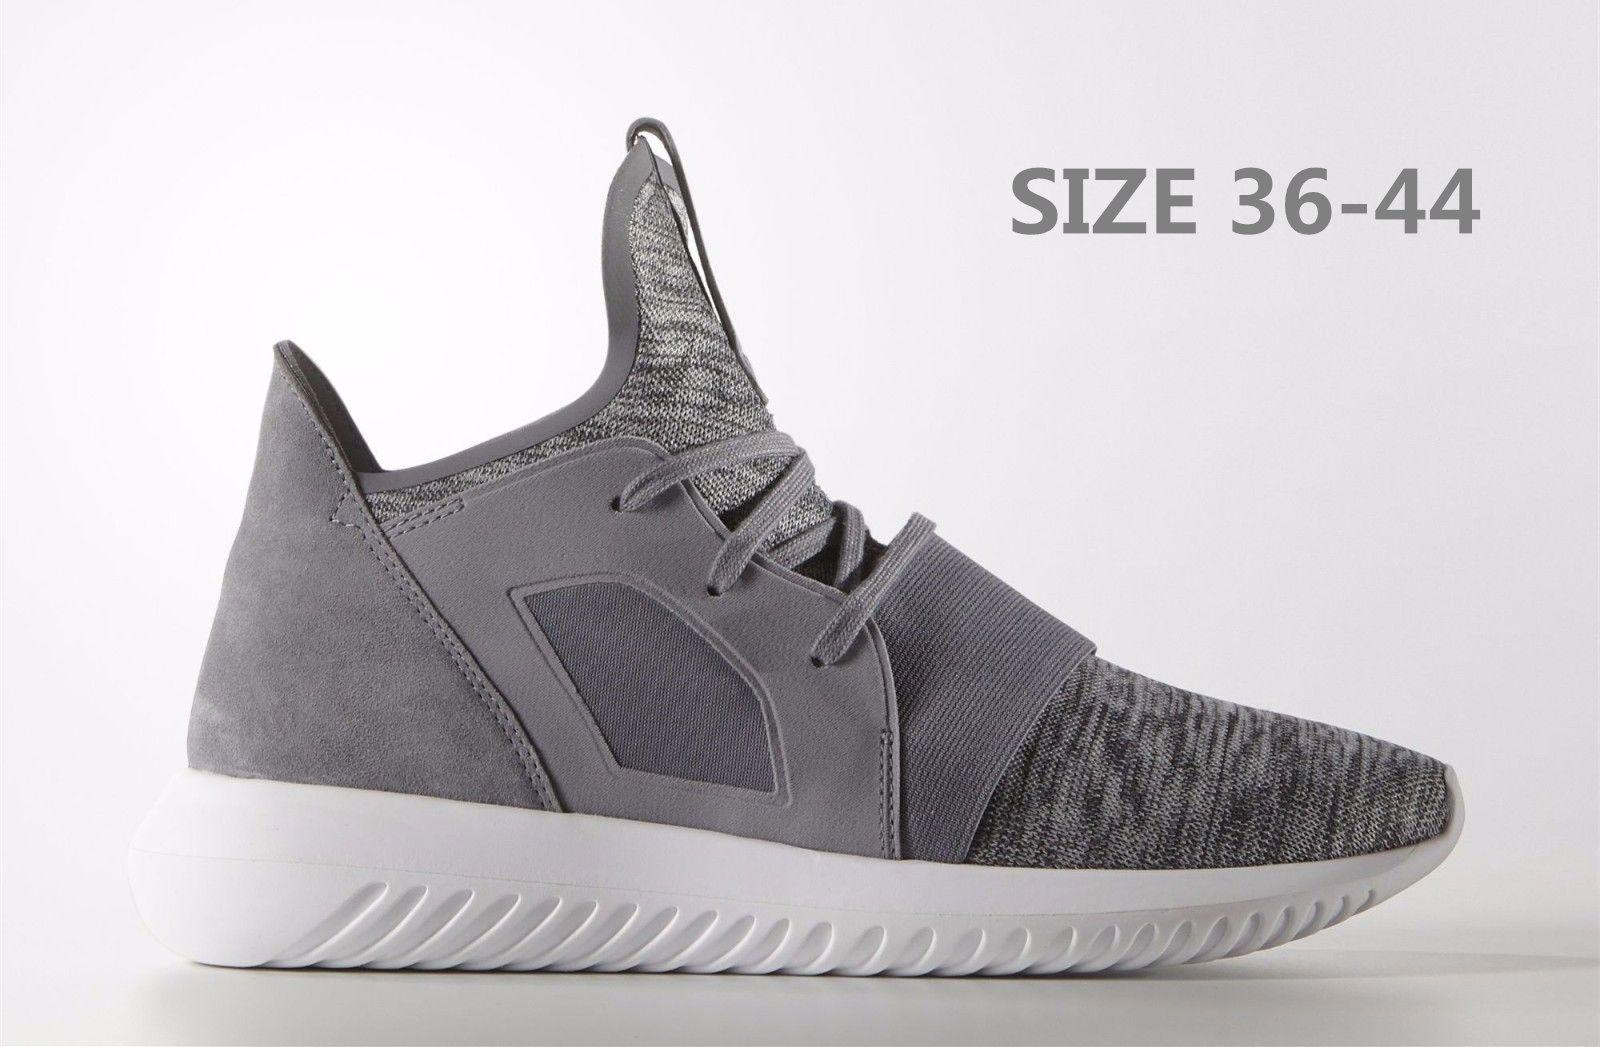 Ultra Boost uncaged LTD zapatos barato Adidas